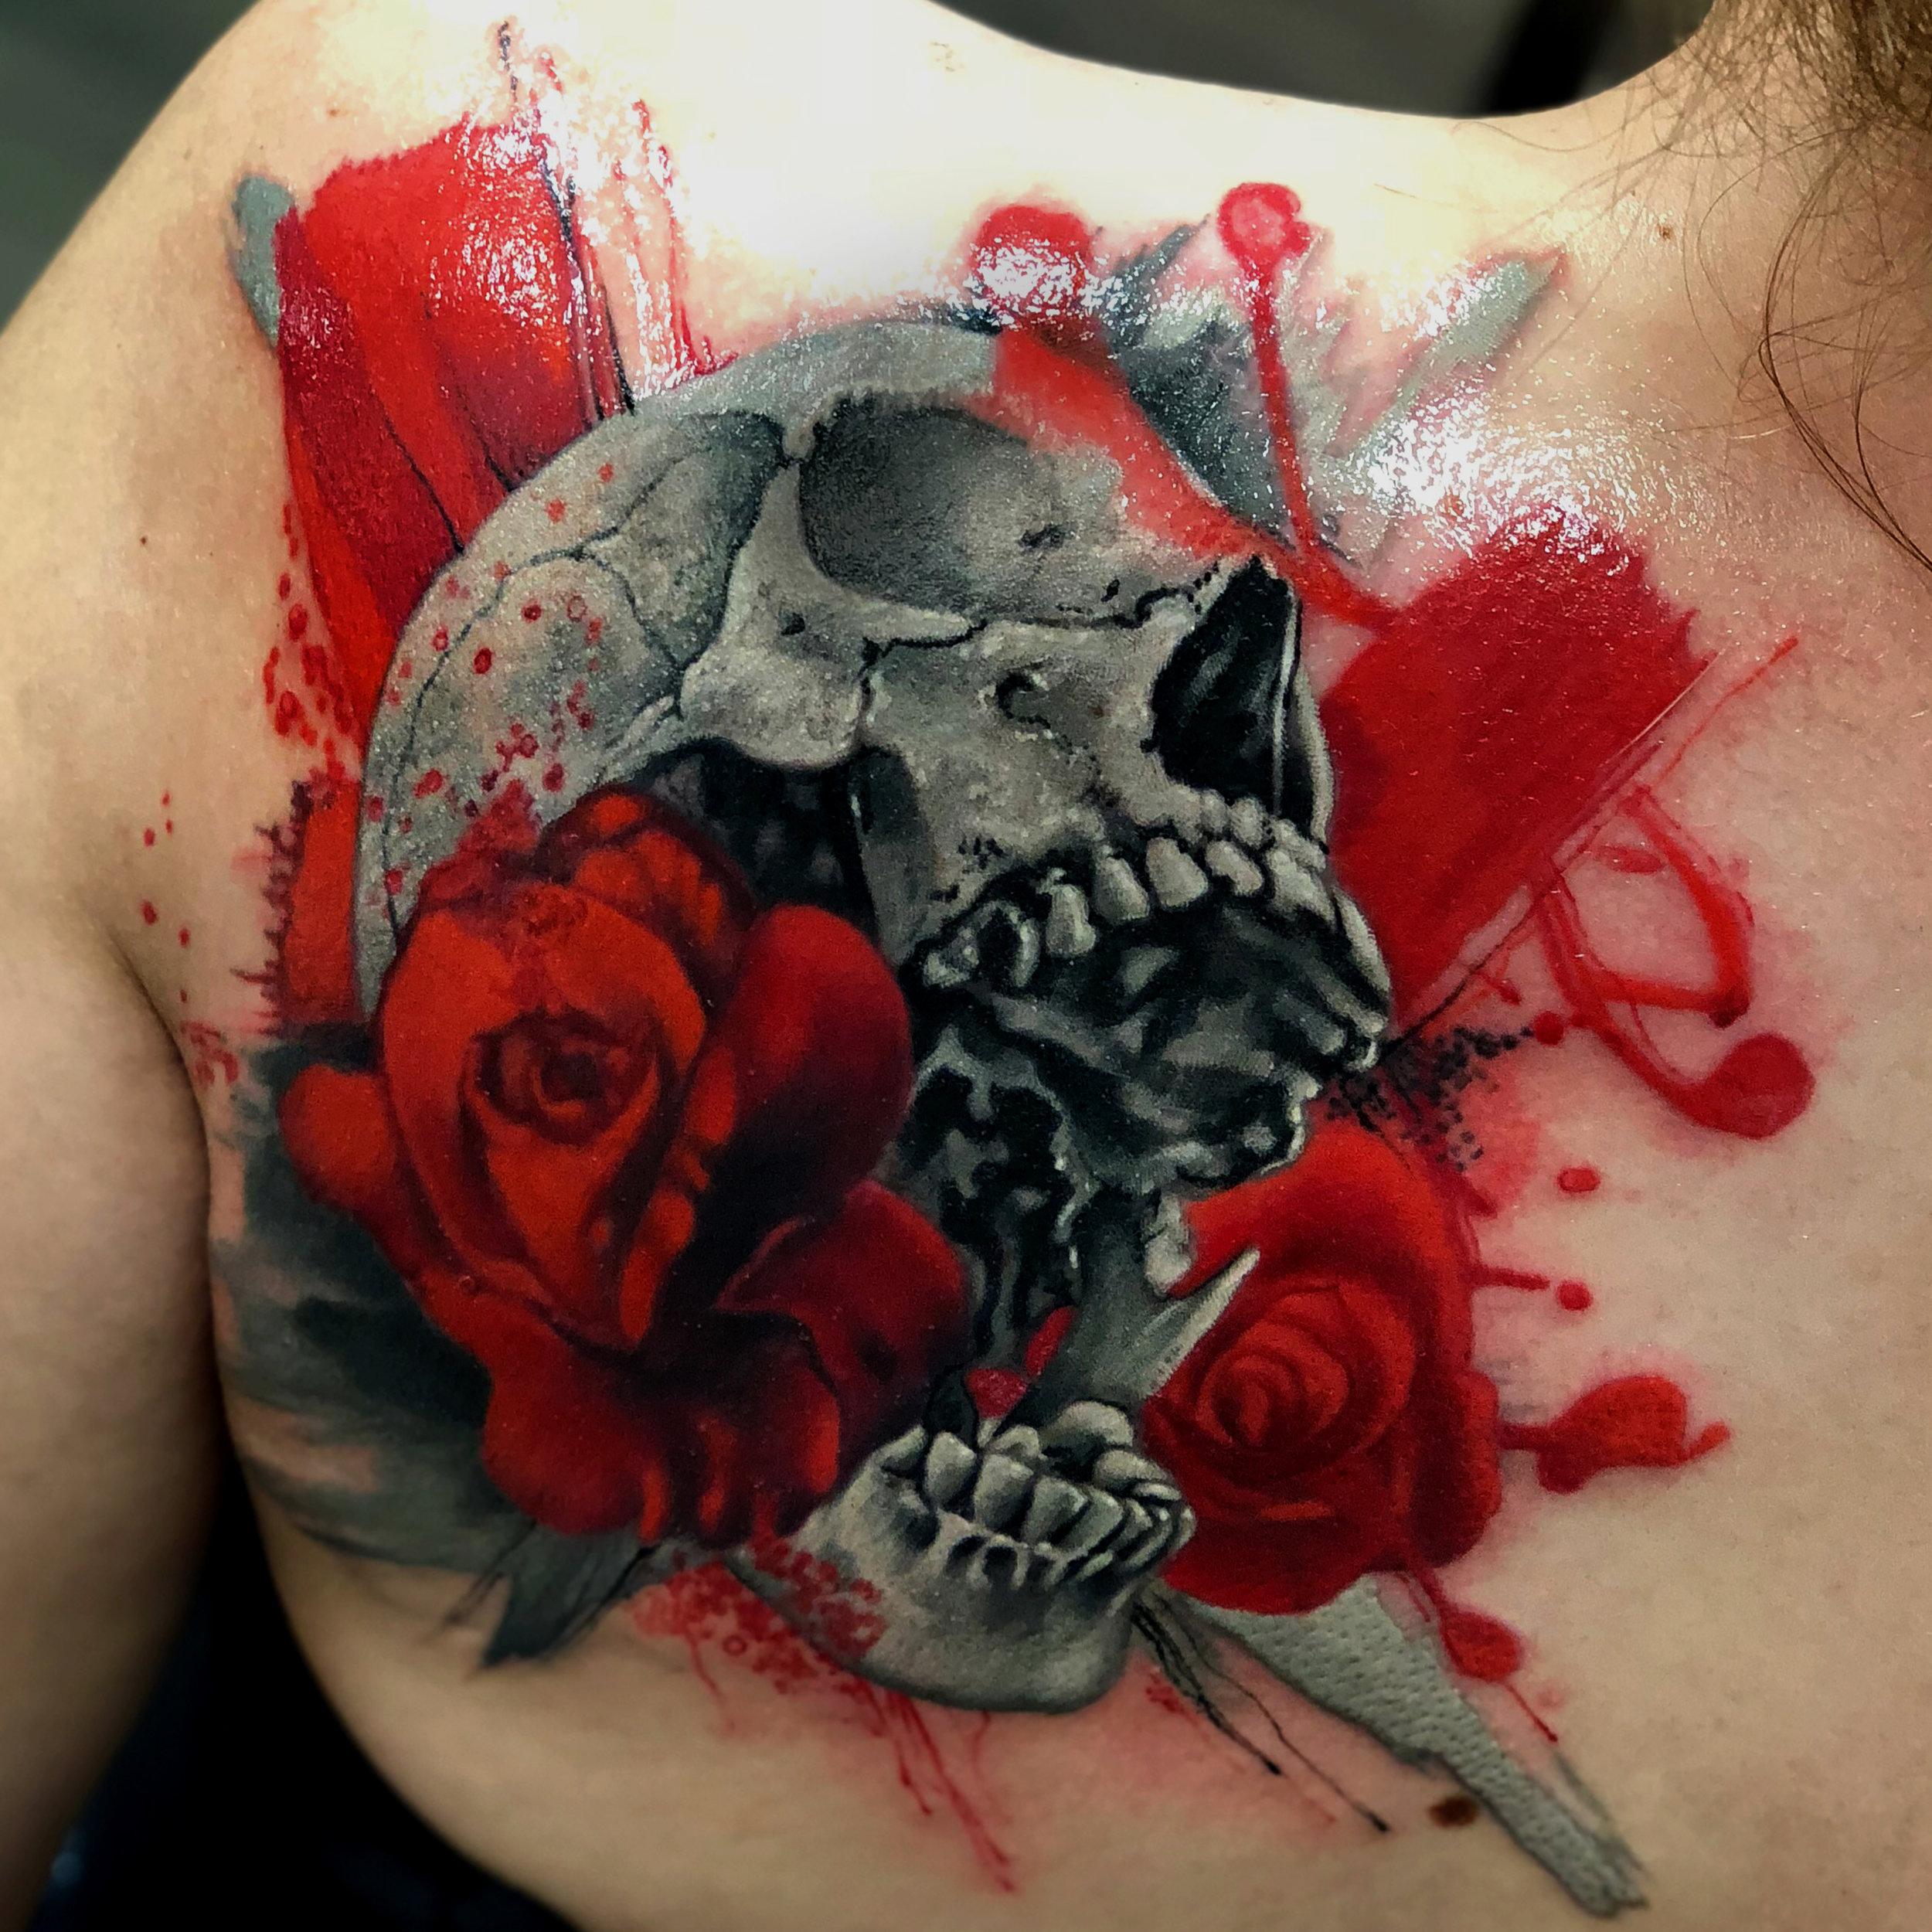 Skull Red Roses Trash Polka Liz Cook Tattoo.jpg